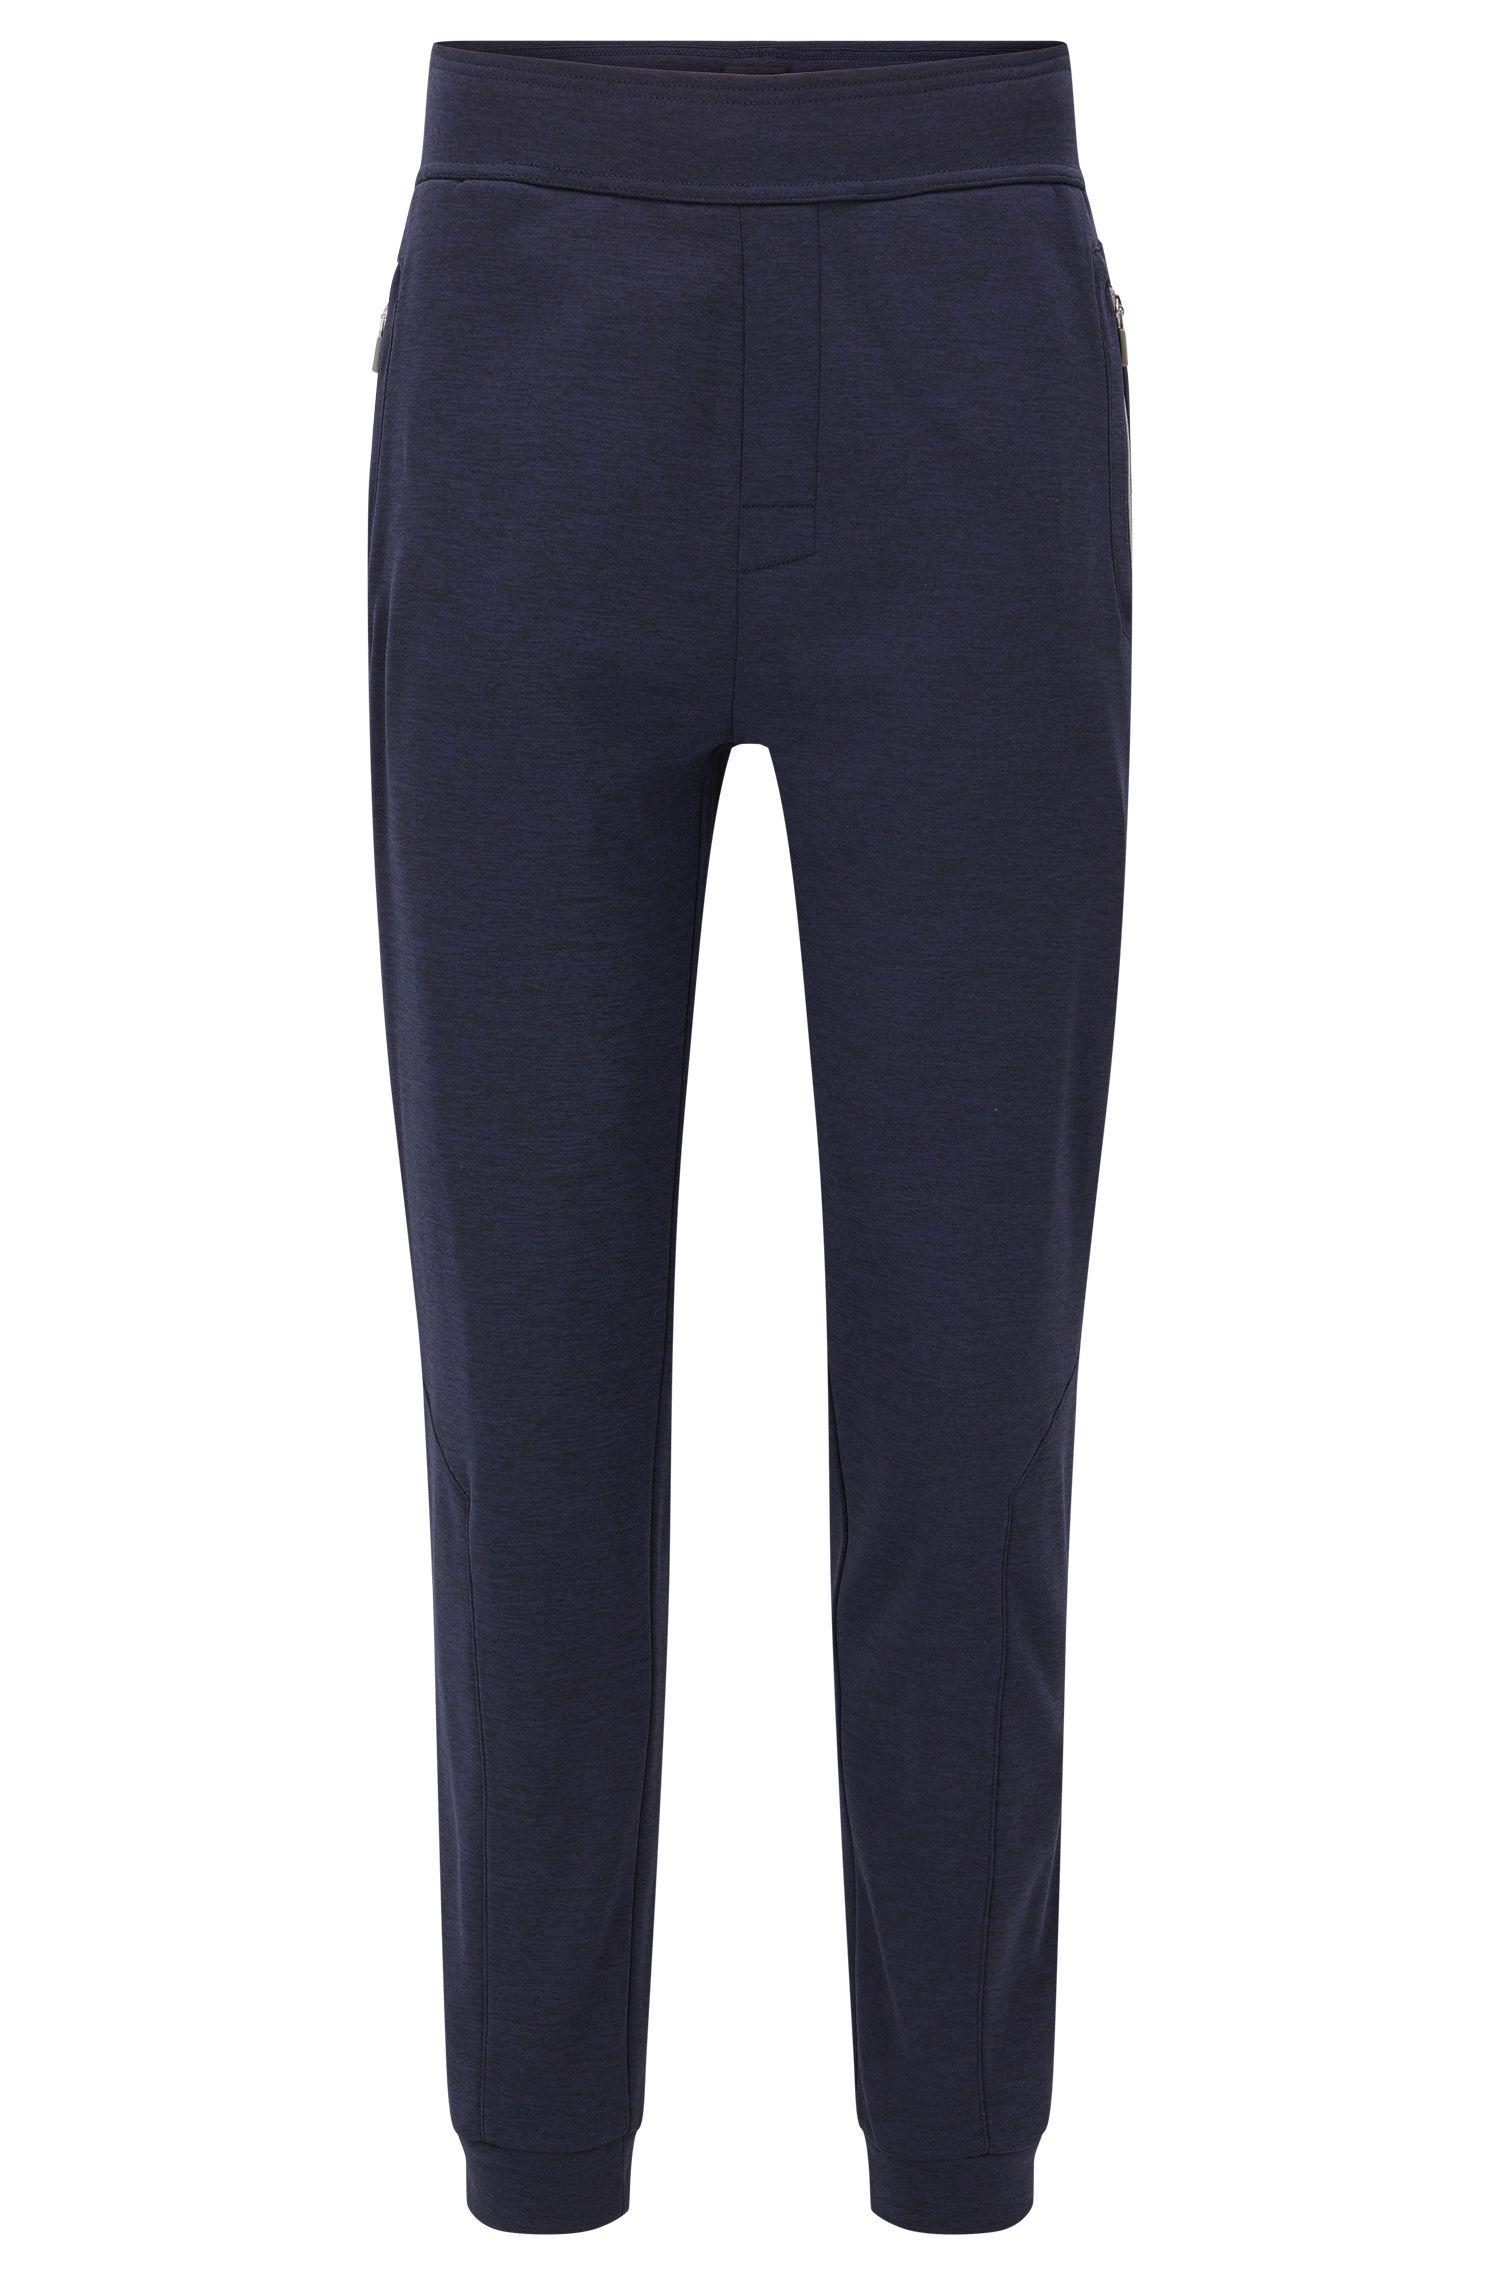 Stretch Cotton Lounge Pant | Long Pant Cuffs, Dark Purple